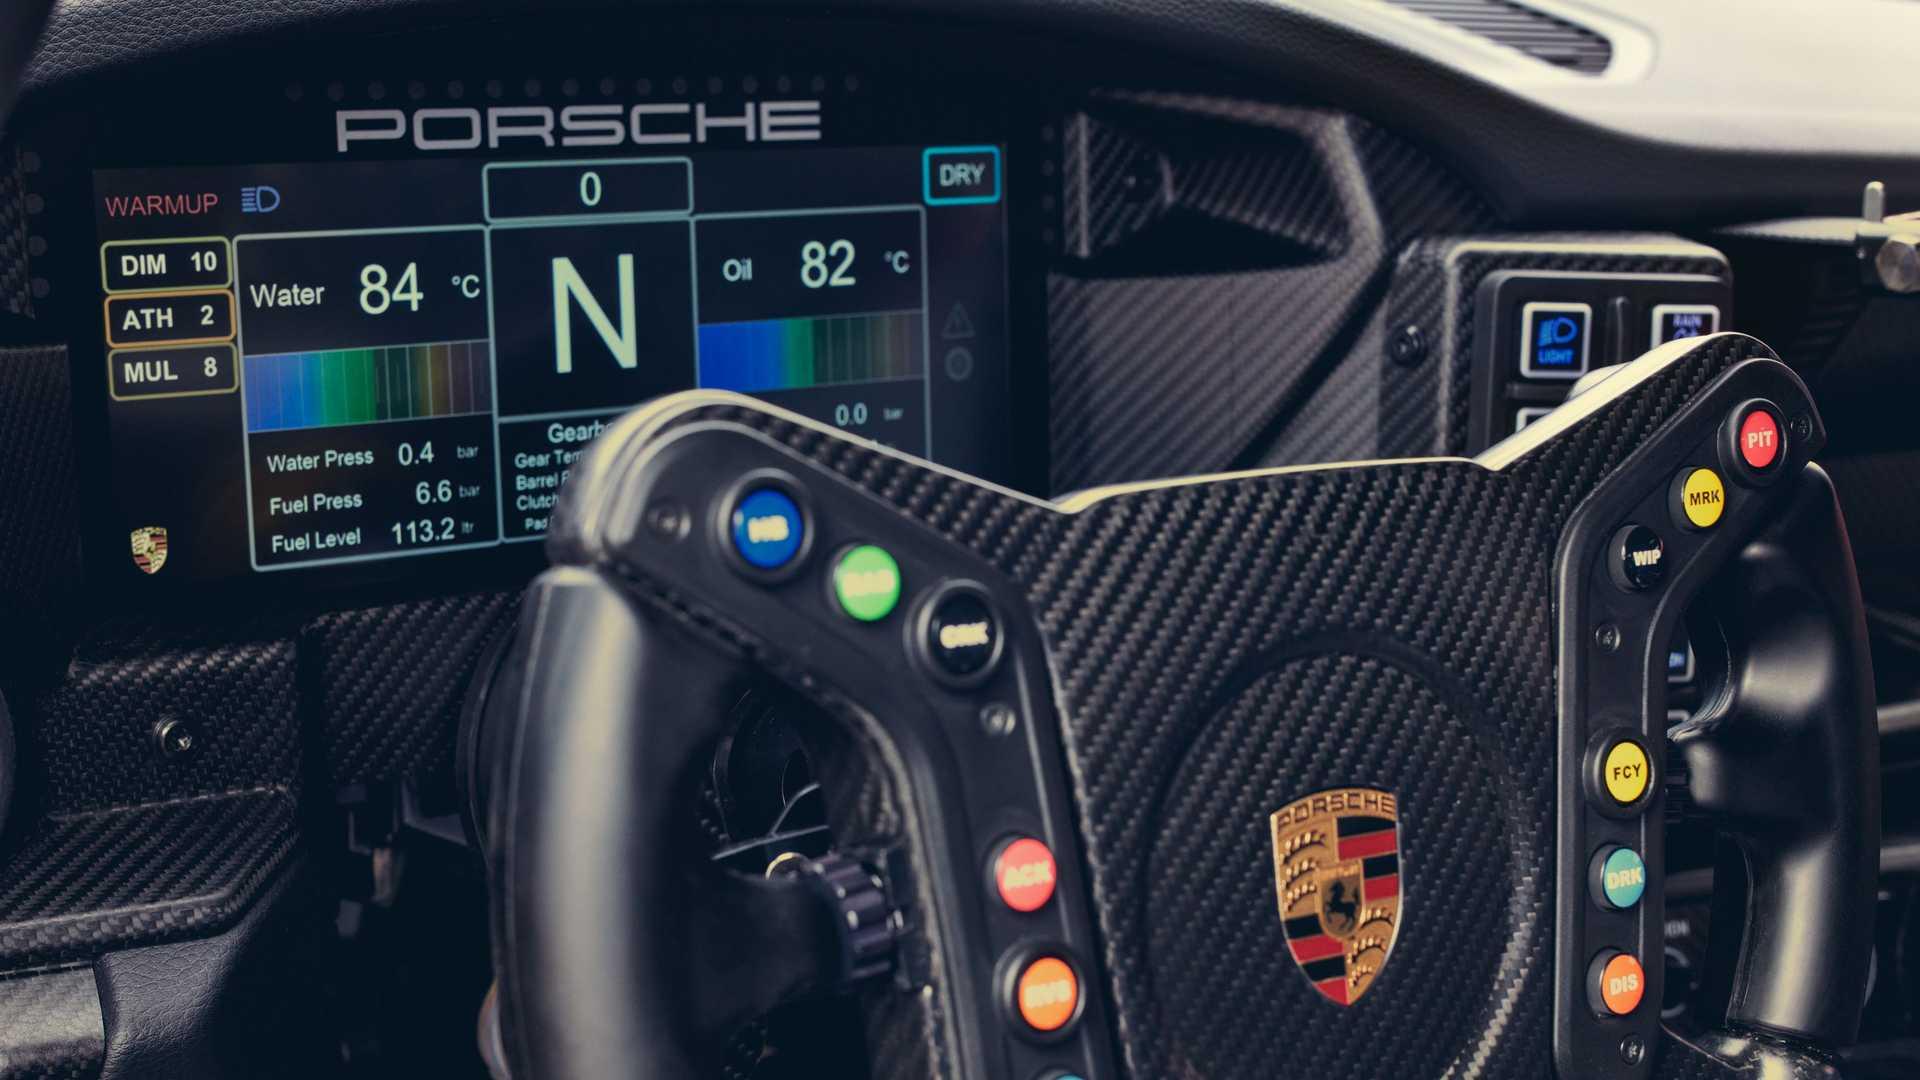 بورشه 911 جي تي 3 الجديدة